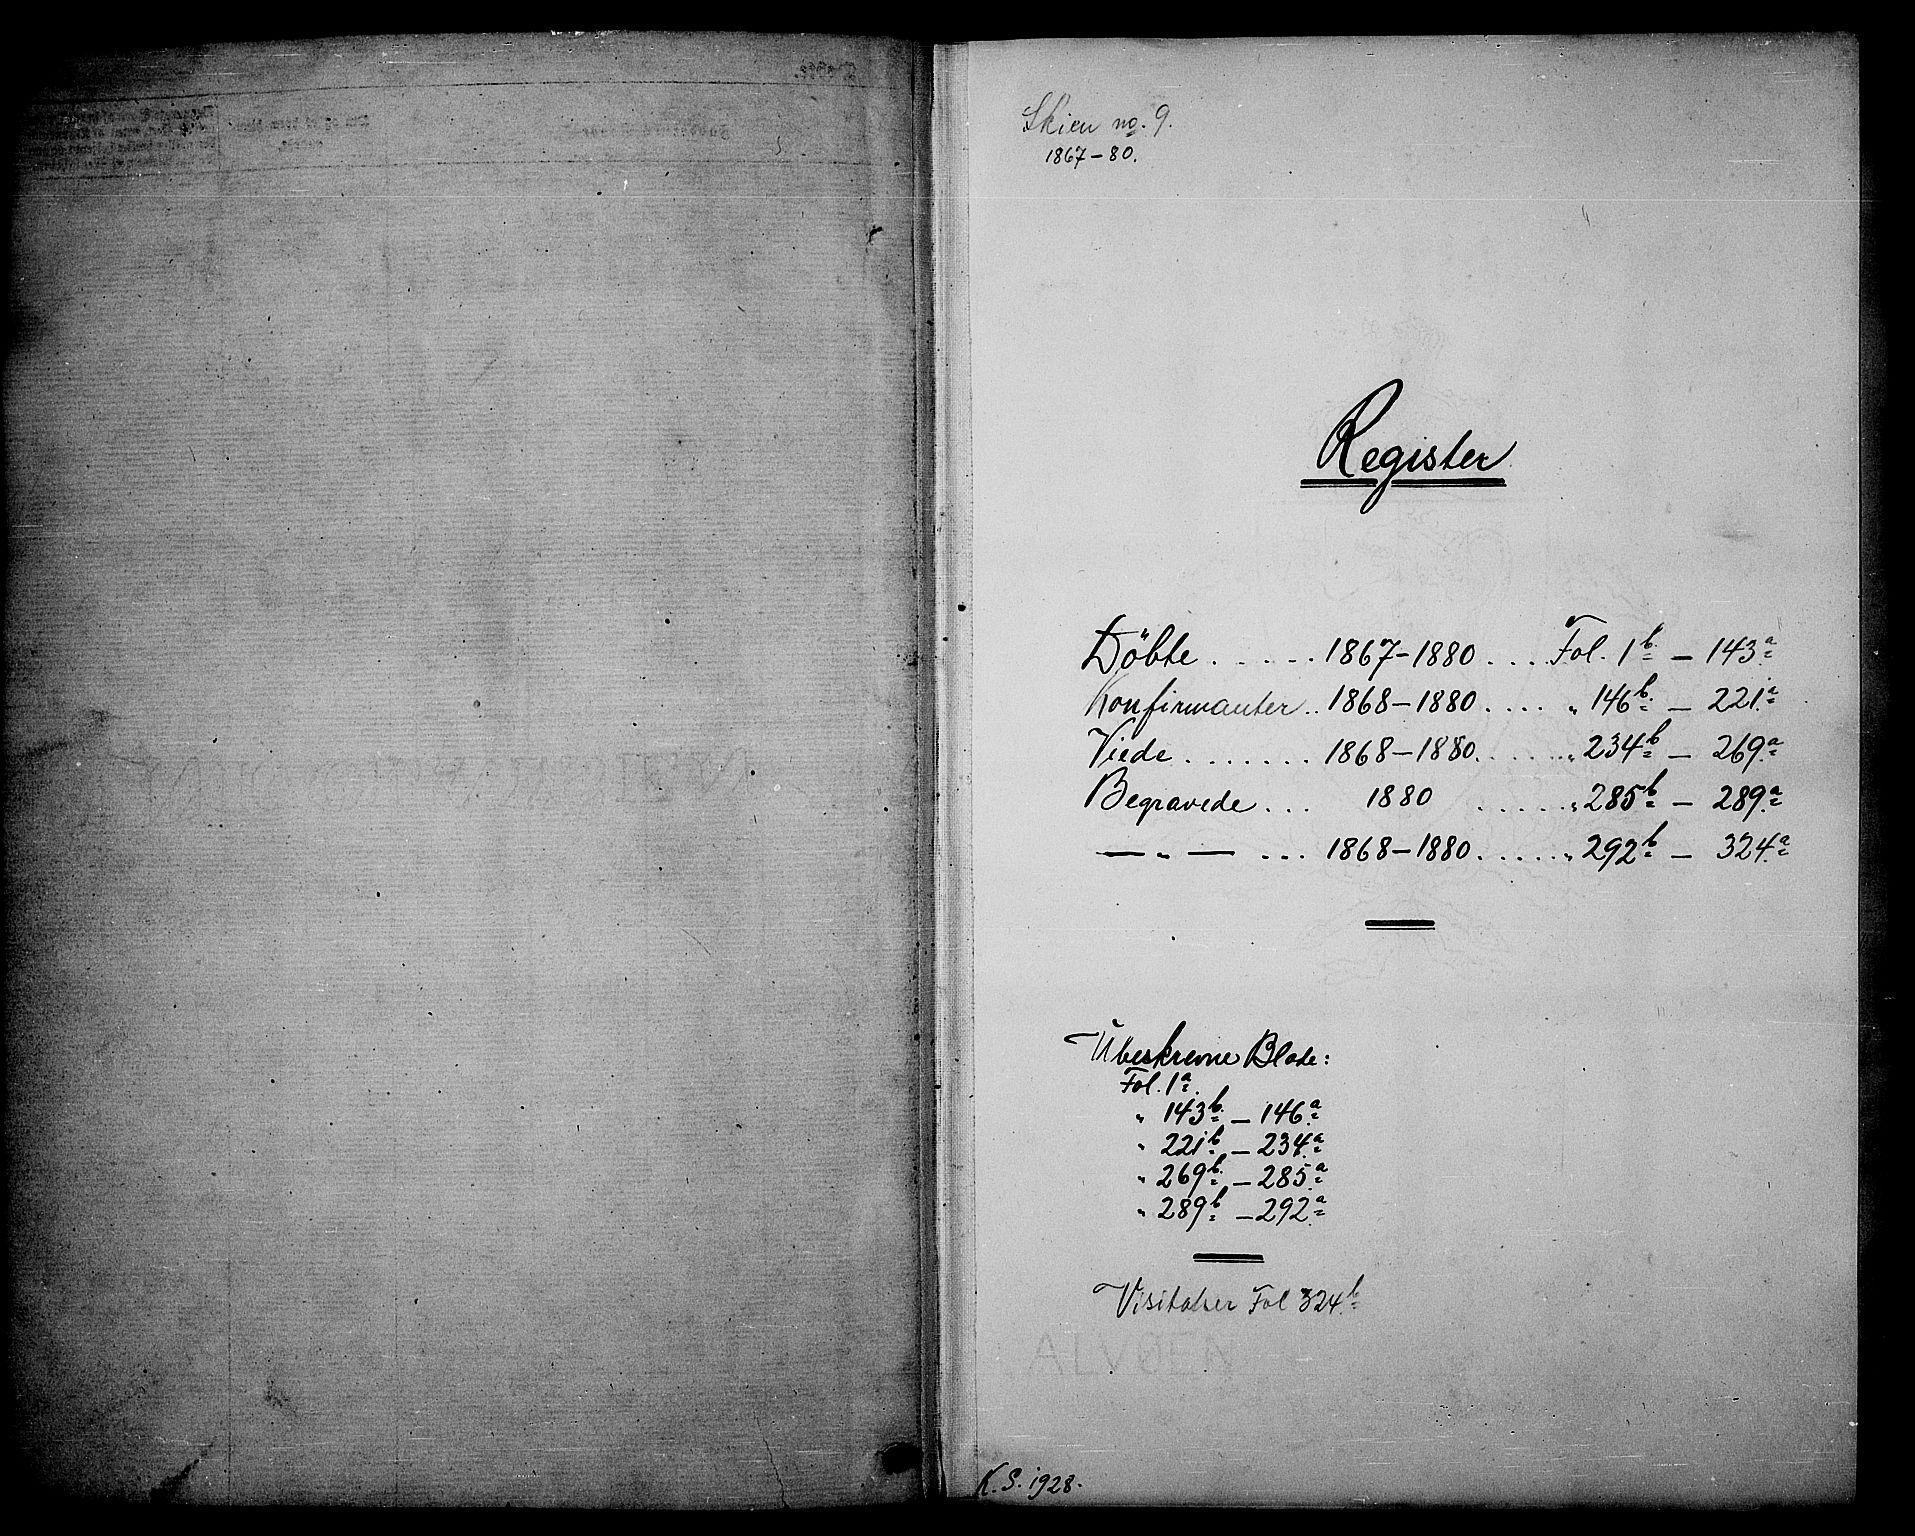 SAKO, Skien kirkebøker, G/Ga/L0005: Klokkerbok nr. 5, 1868-1880